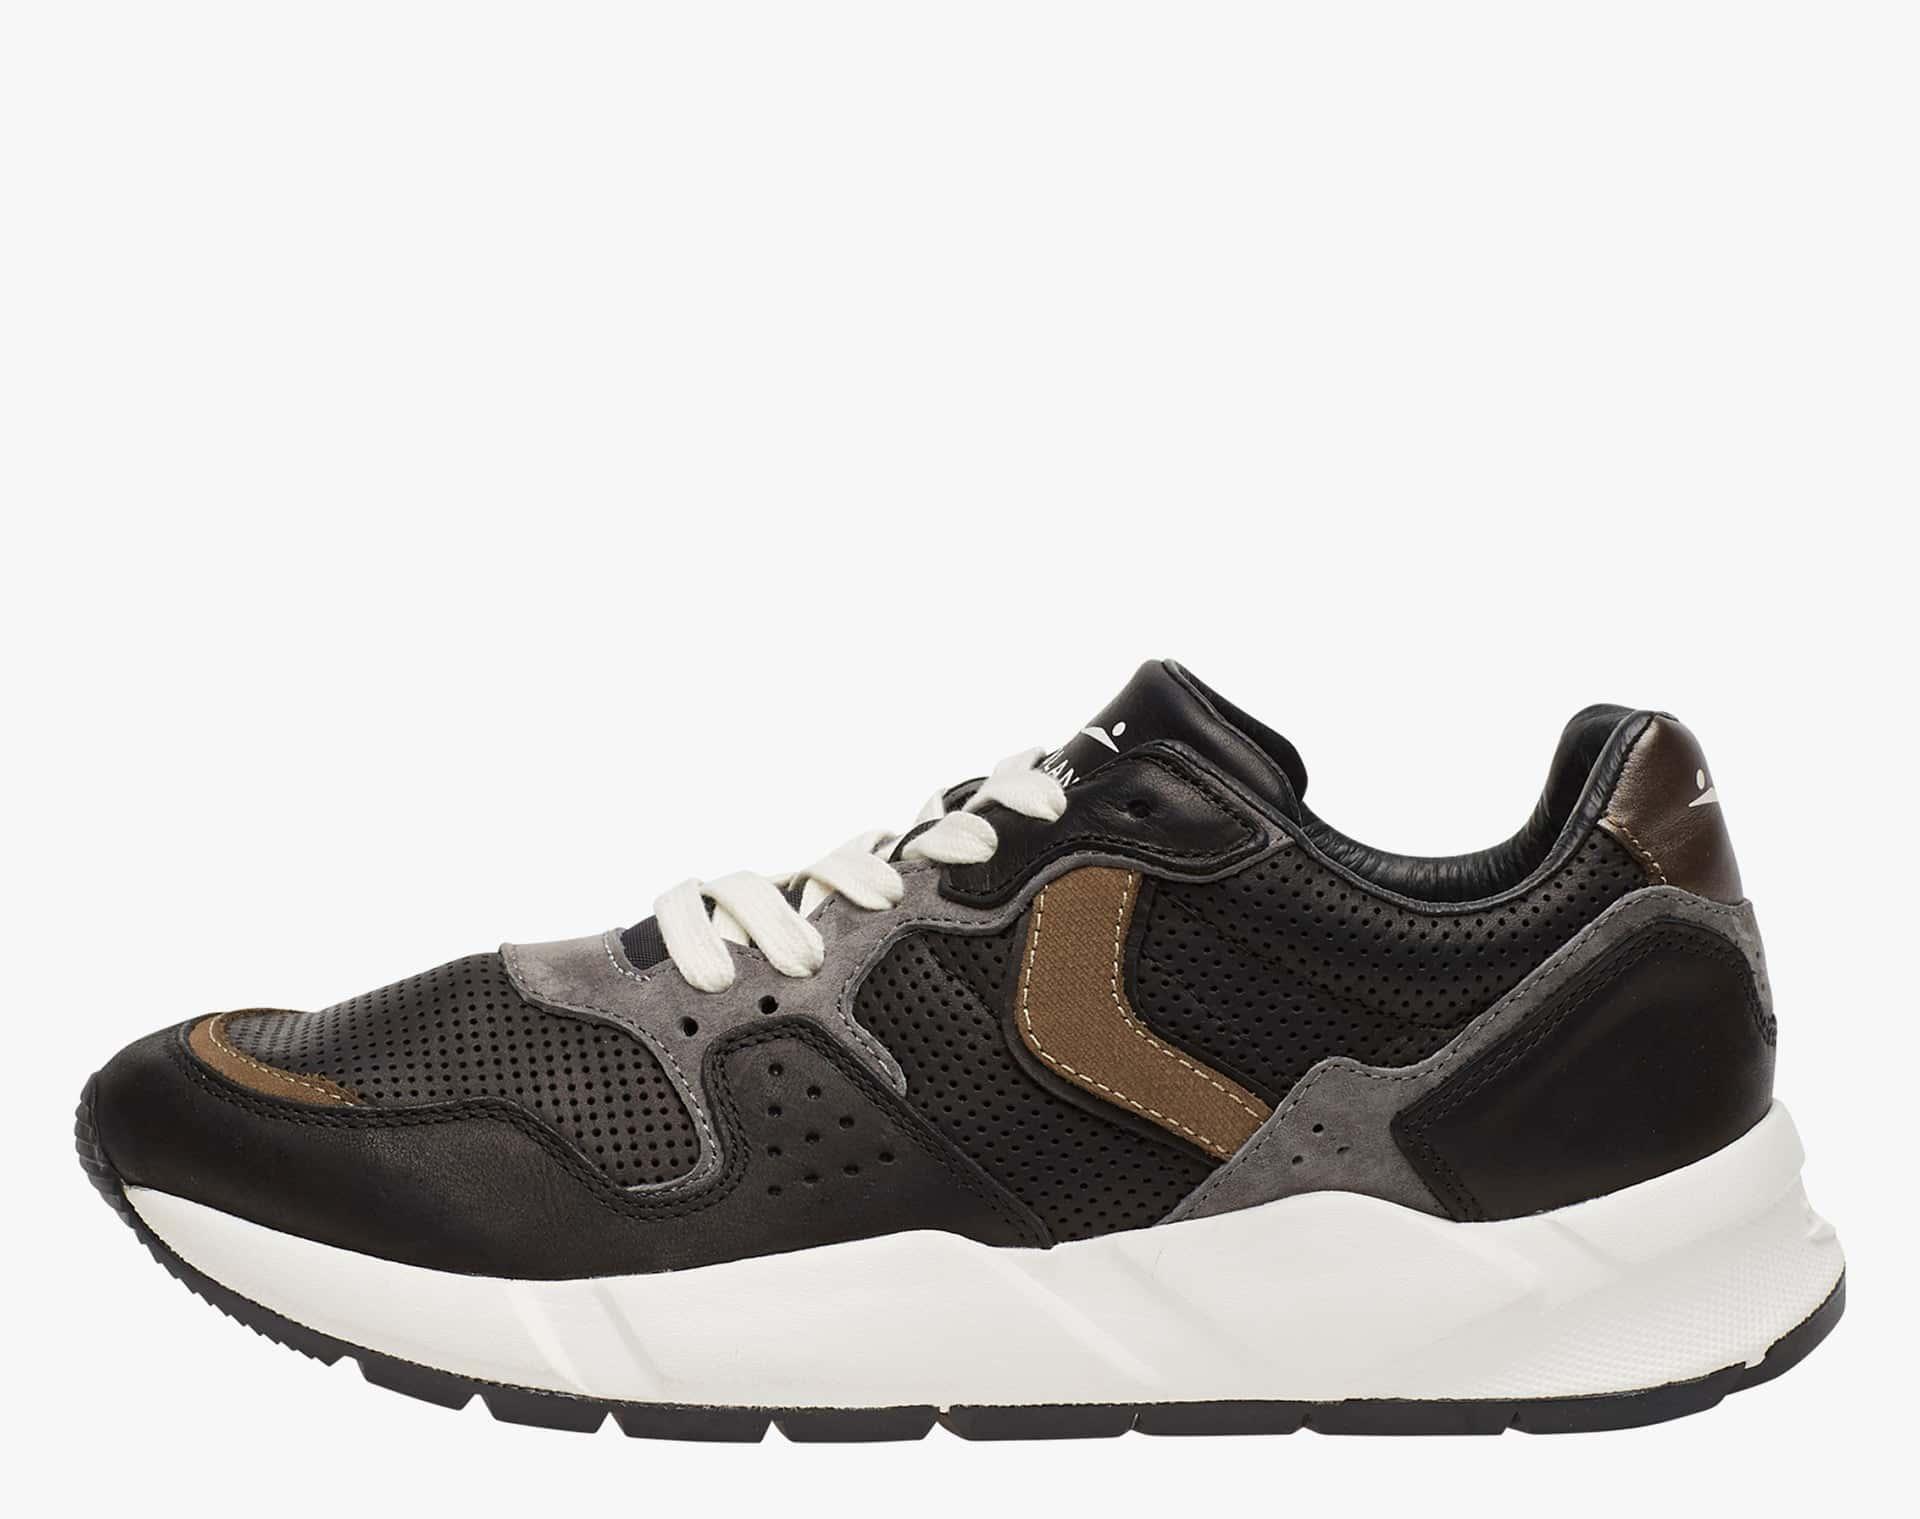 MAMBA - Leather sneakers - BLACK